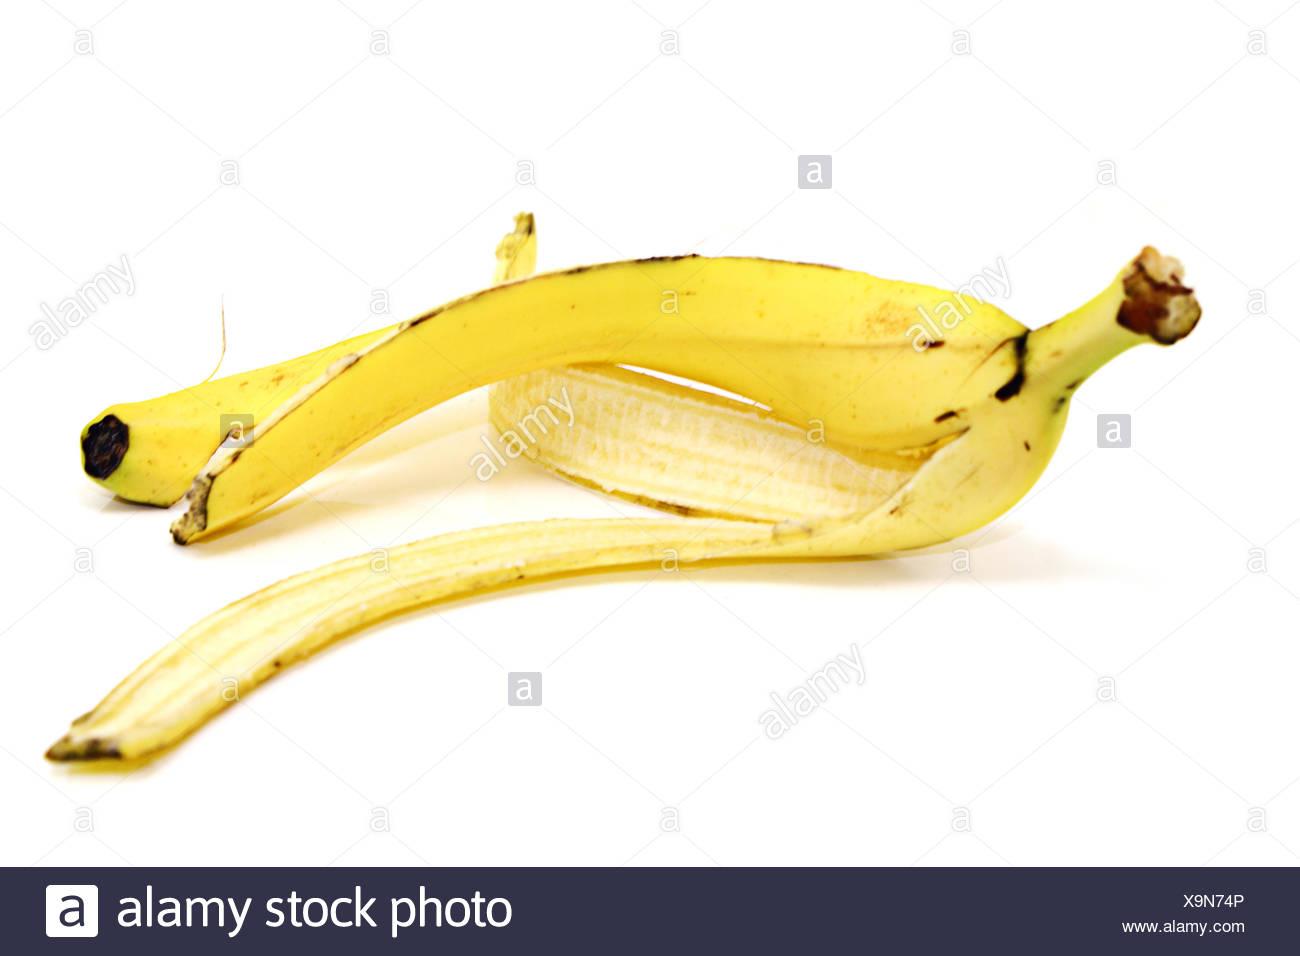 banana peel on withe background isolated - Stock Image